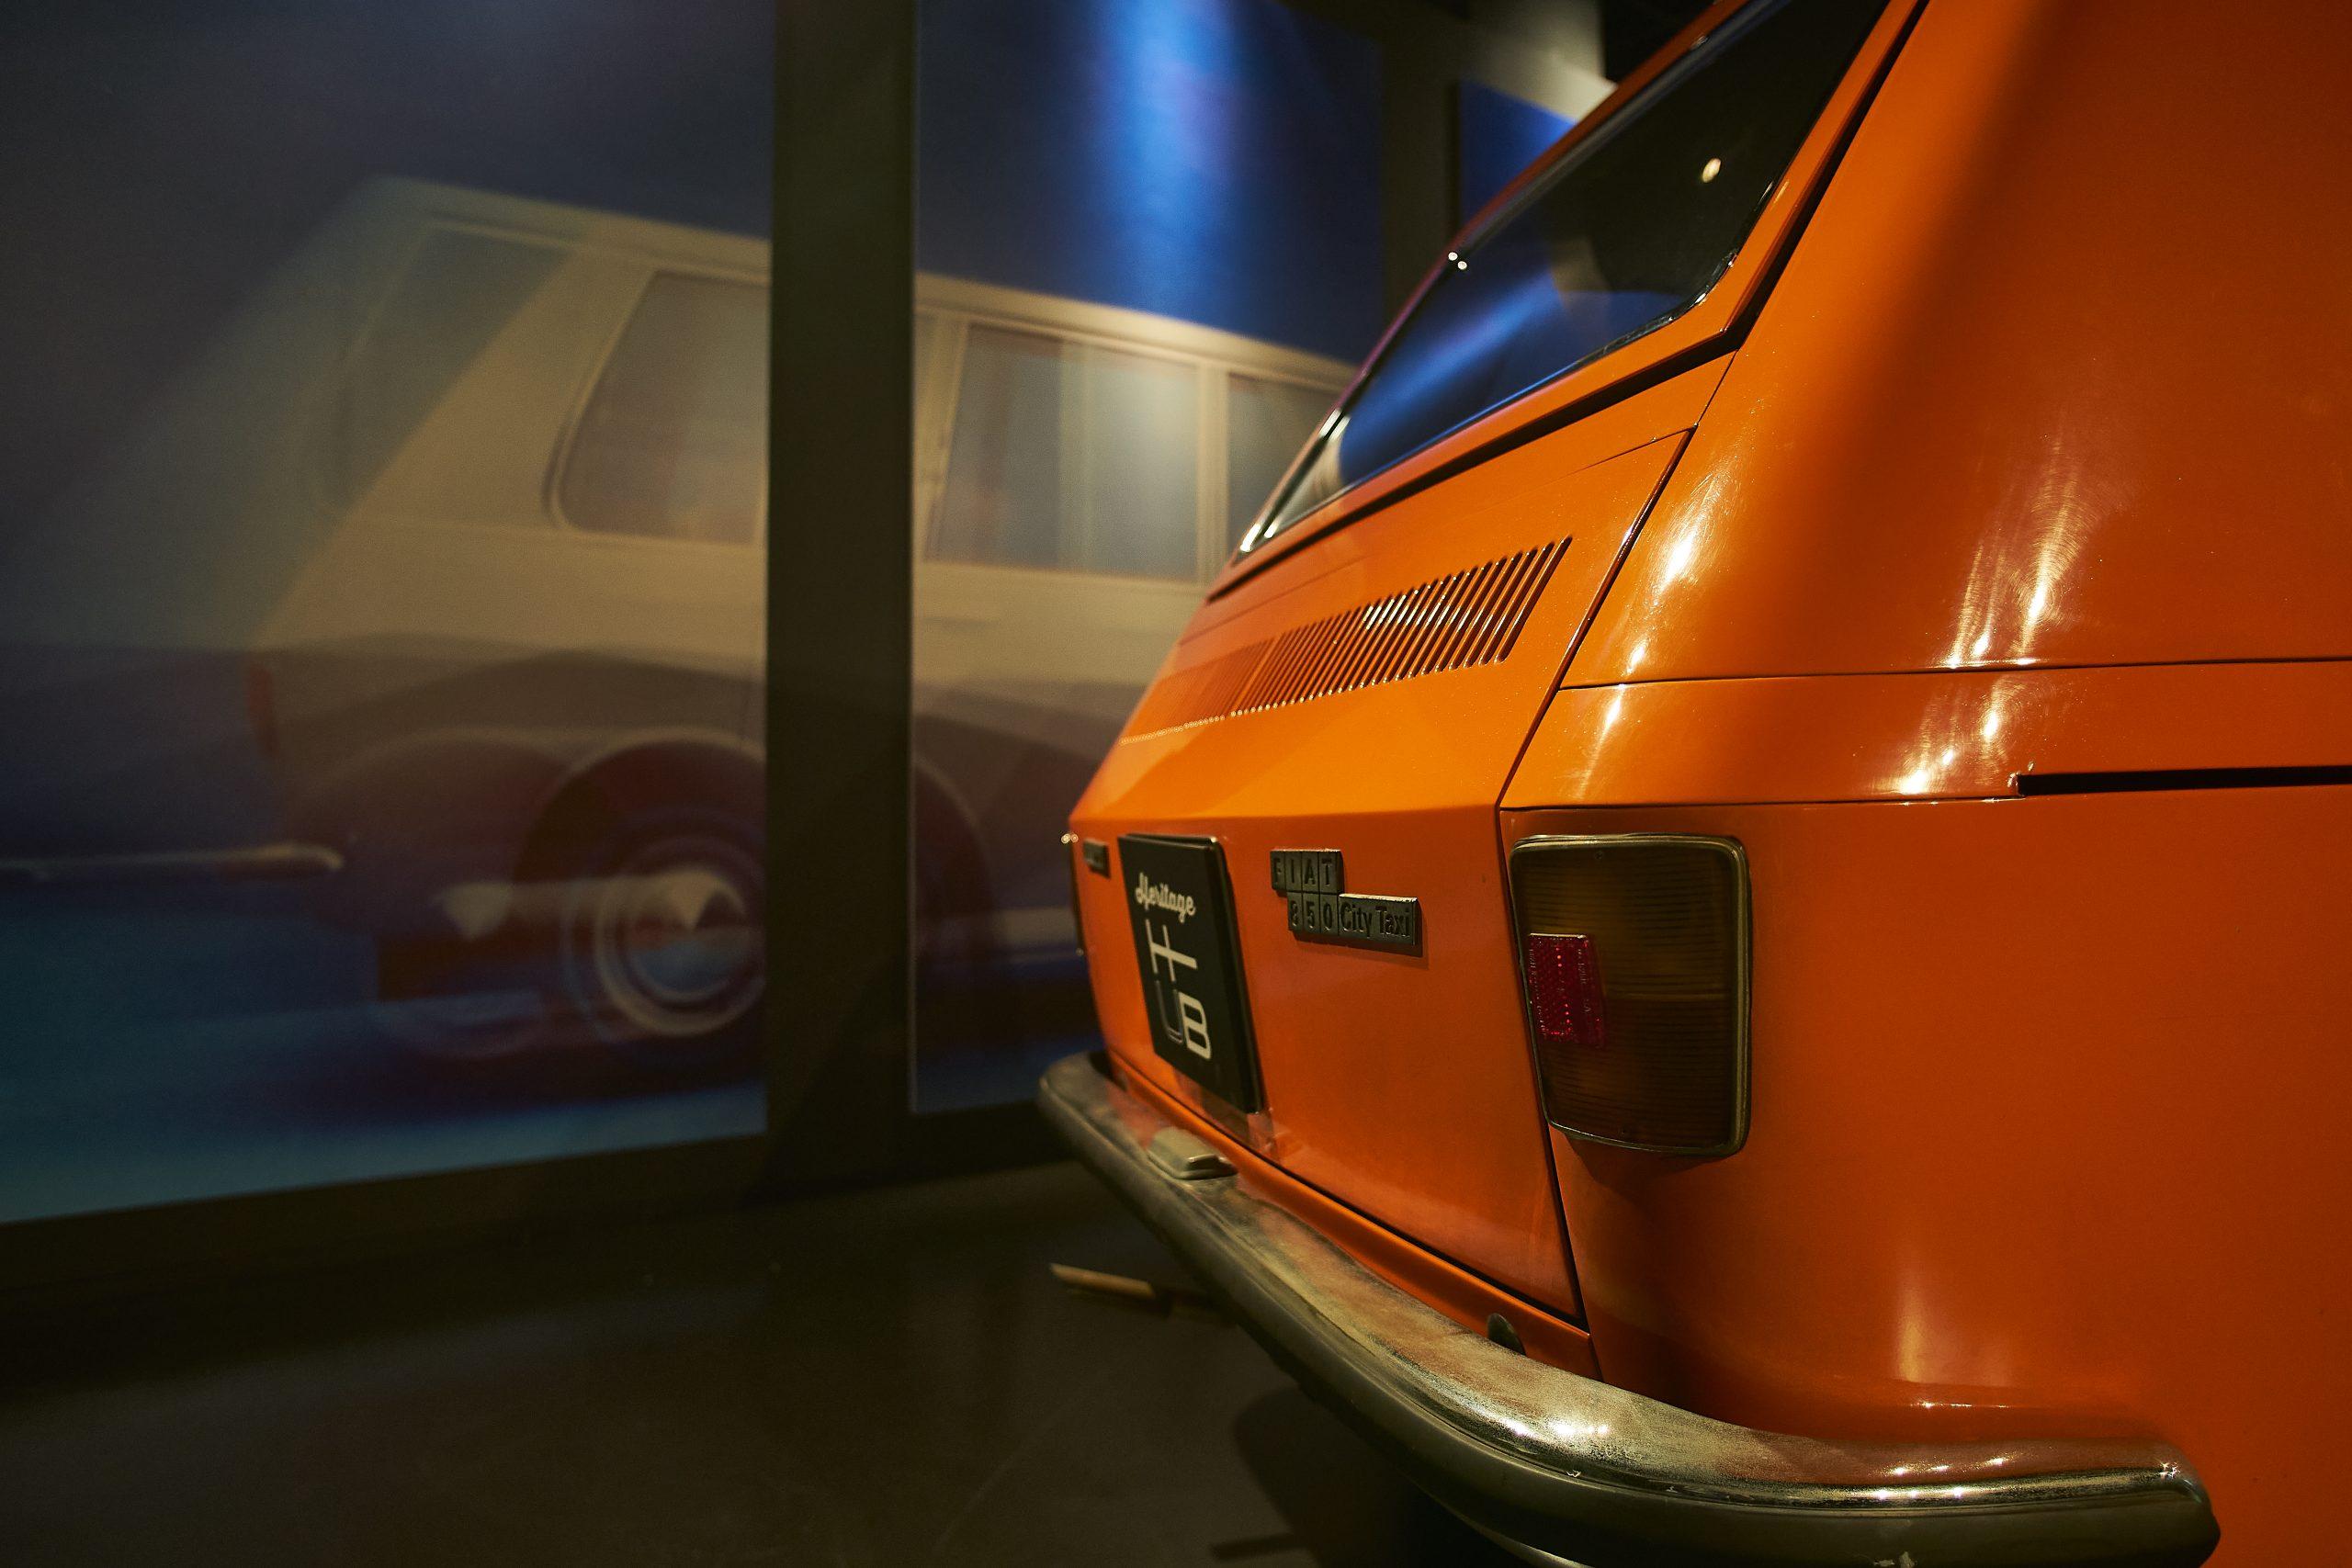 06 Fiat City Taxi scaled H Fiat, o ιδιοφυής σχεδιαστής και ένα περίεργο ταξί Fiat, retro, ειδήσεις, Νέα